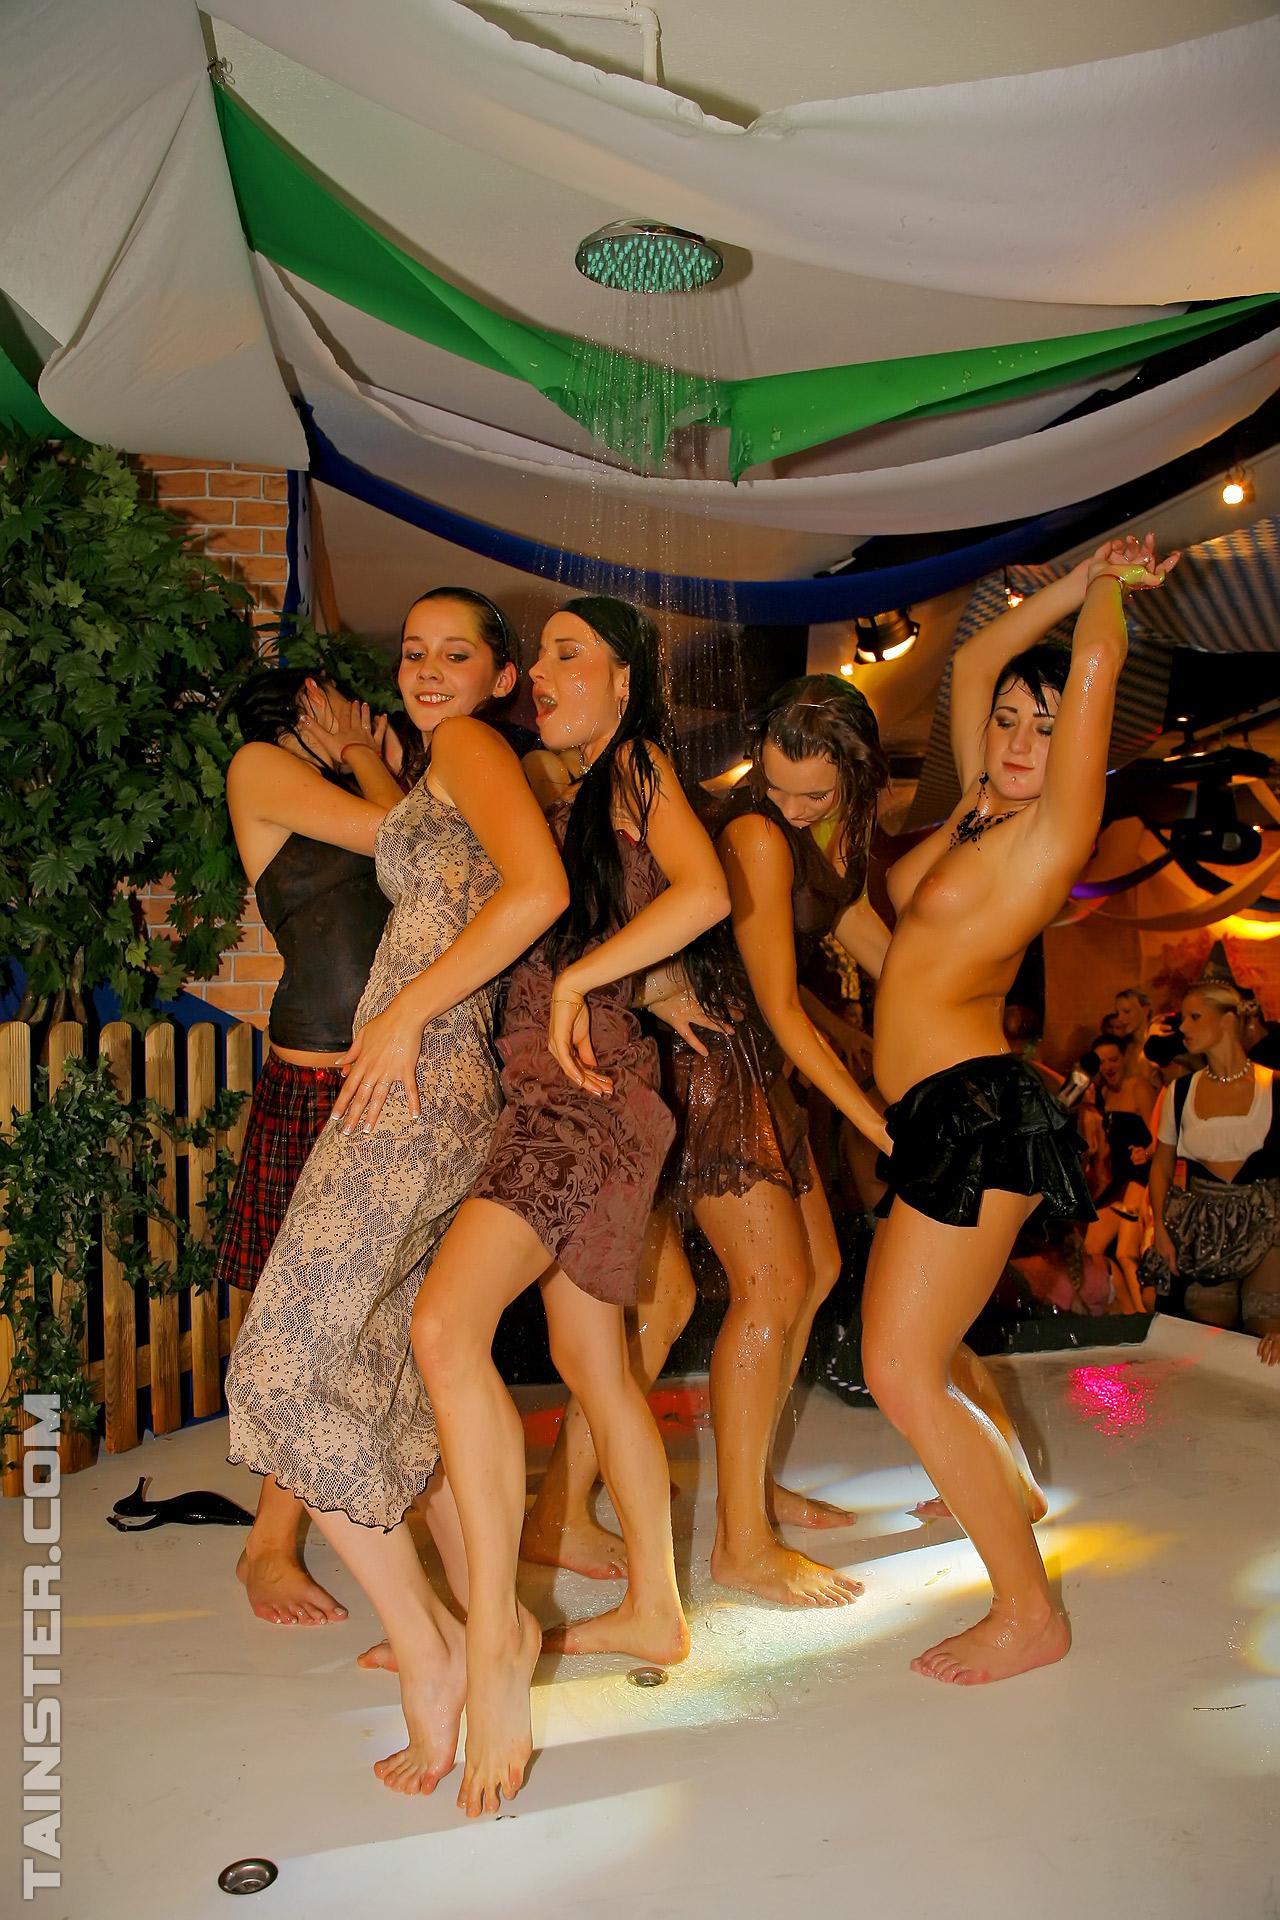 Dream Drunk teens suck the strippers gorgeous